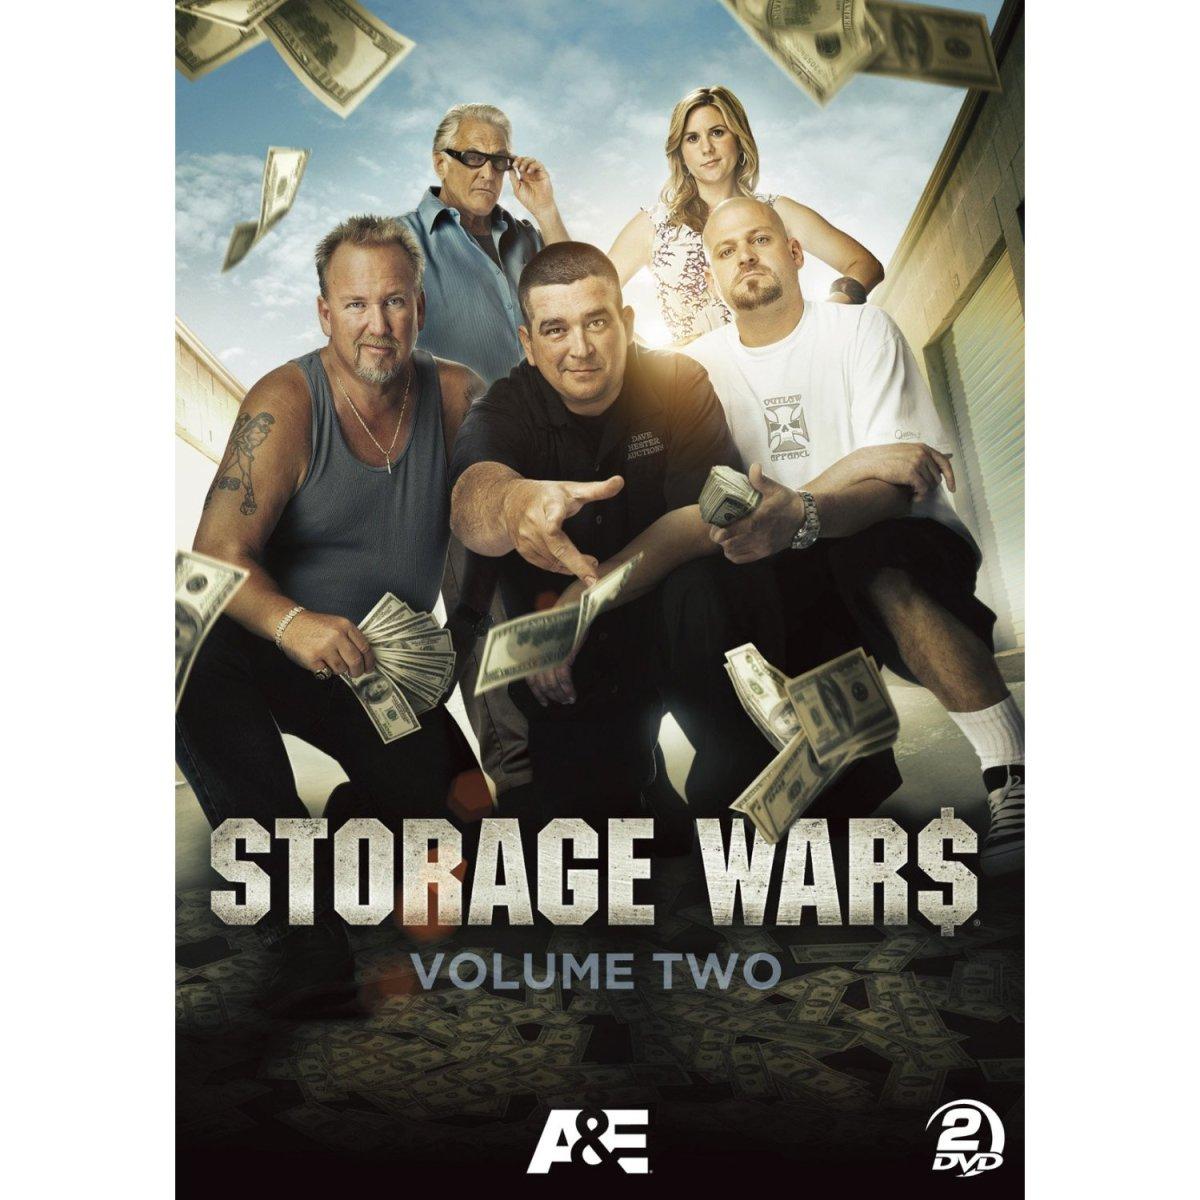 Storage Wars: Volume Two – DVD Review